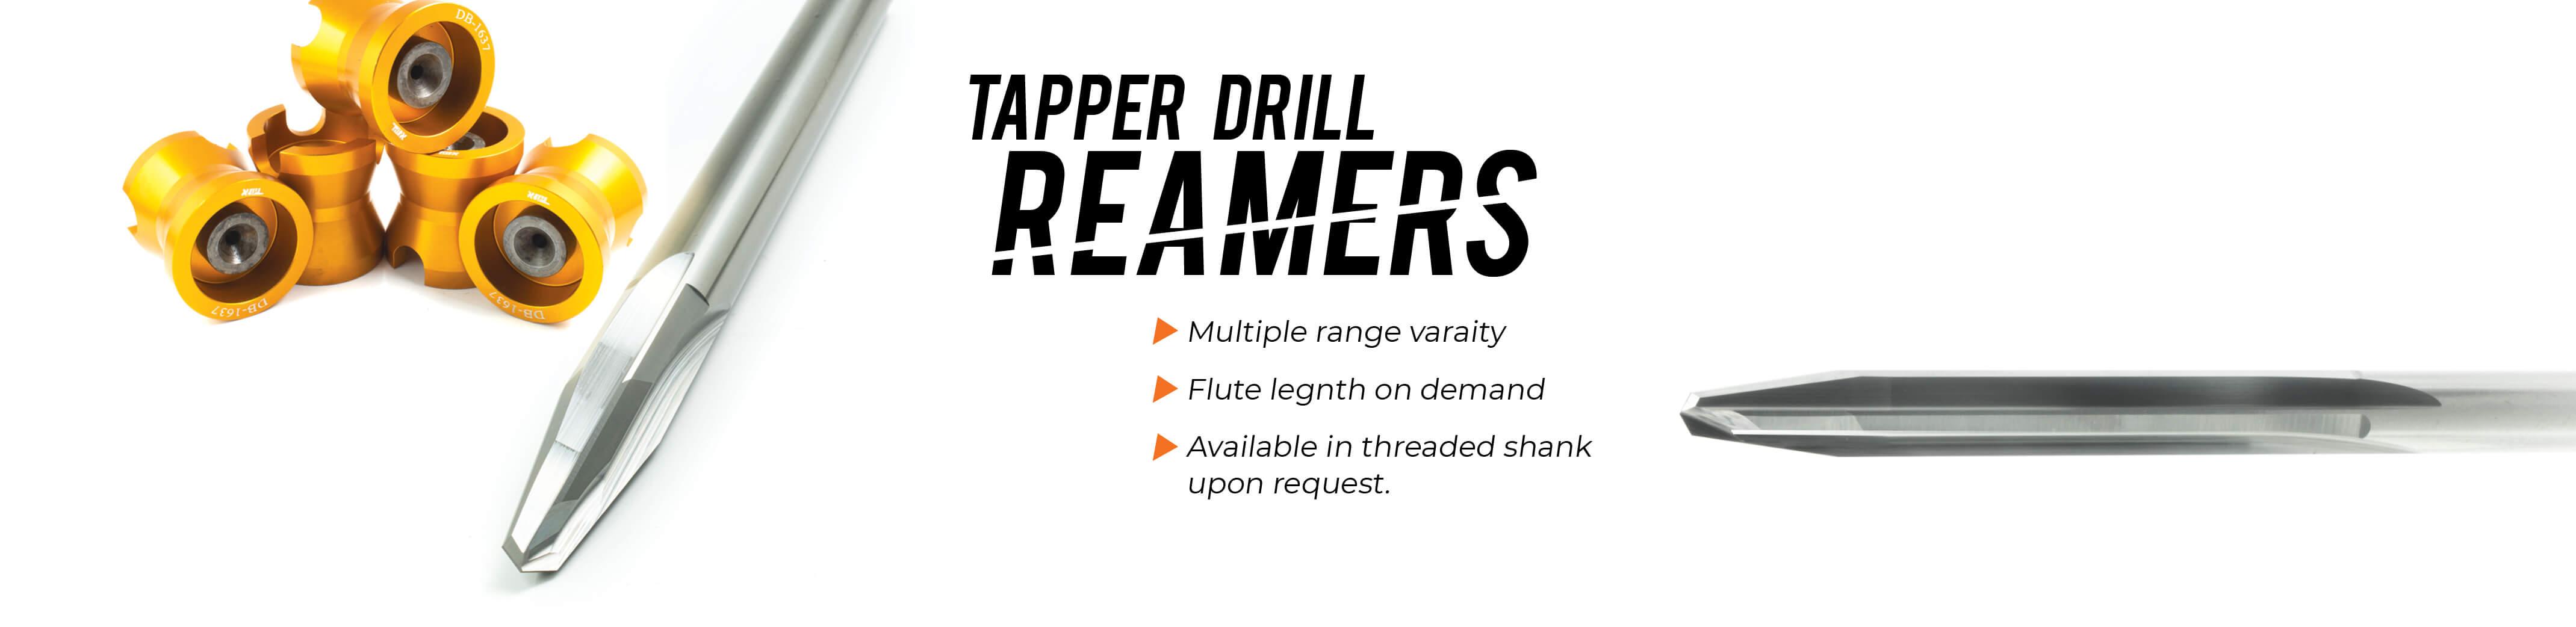 Tapper drill Reamer